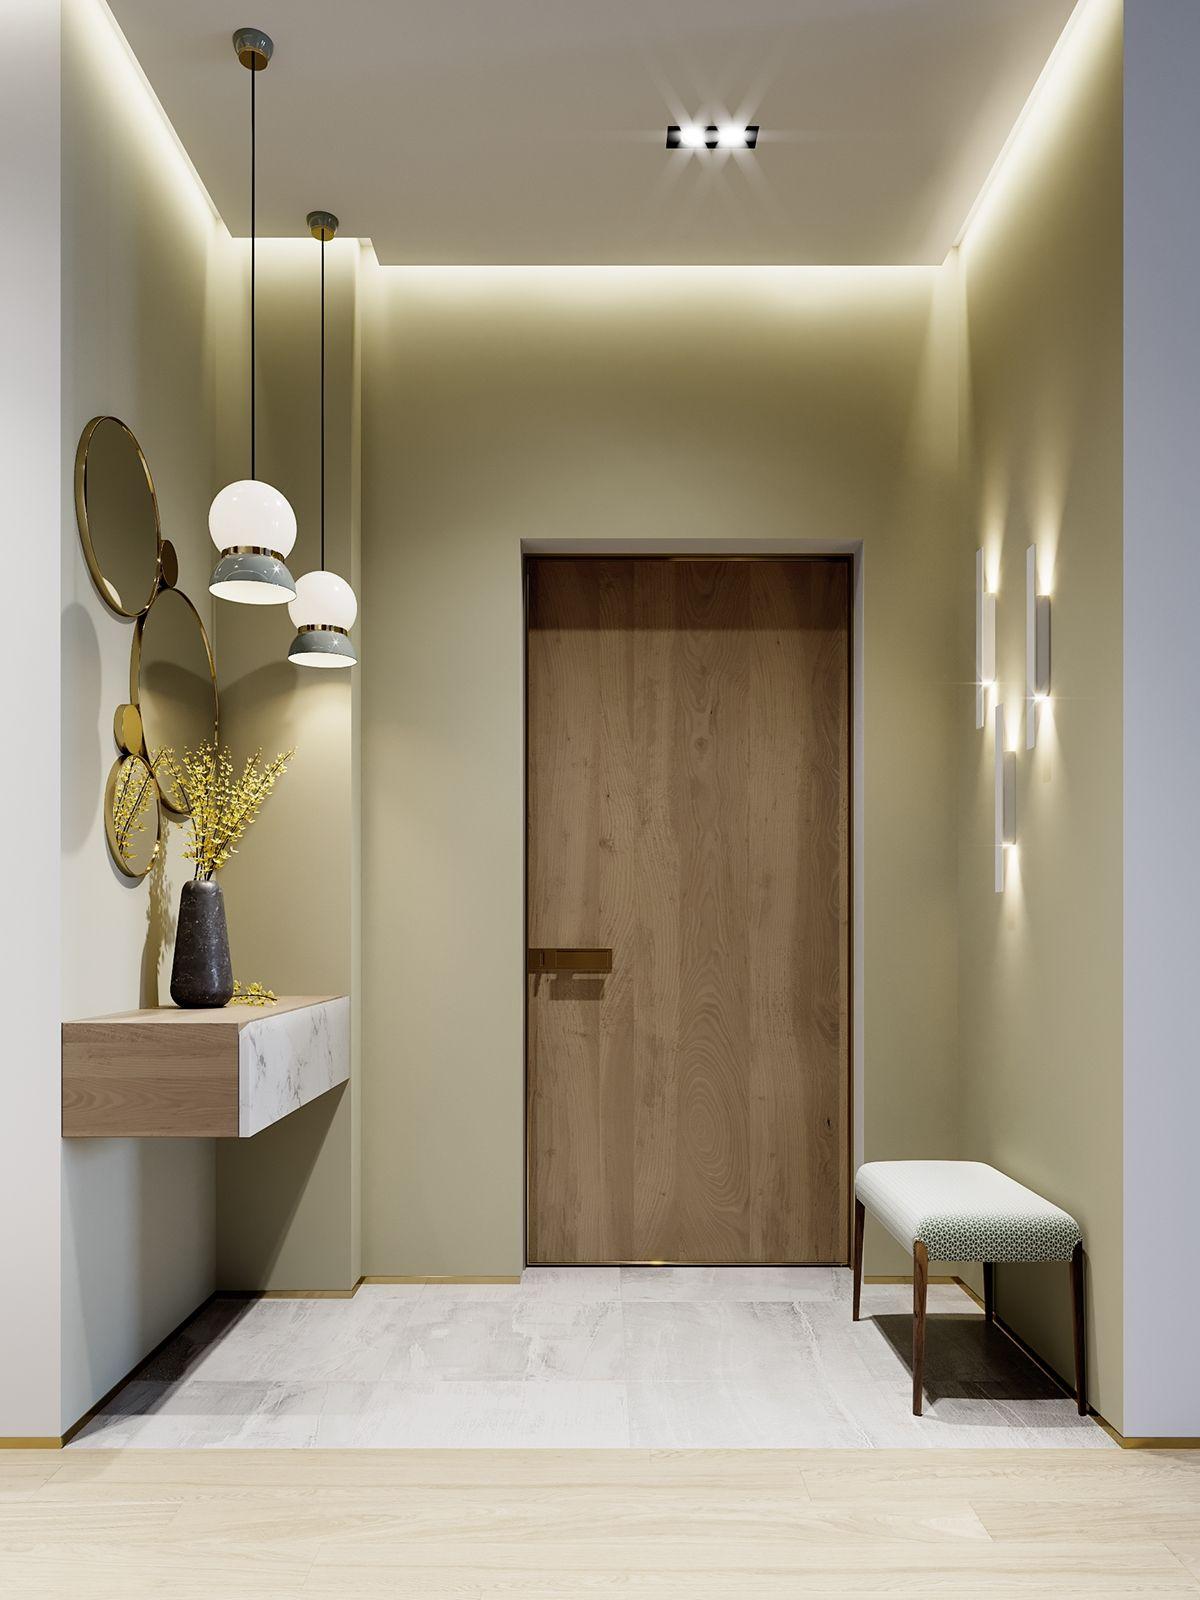 3d Interior Room Design: Design, Small Apartments